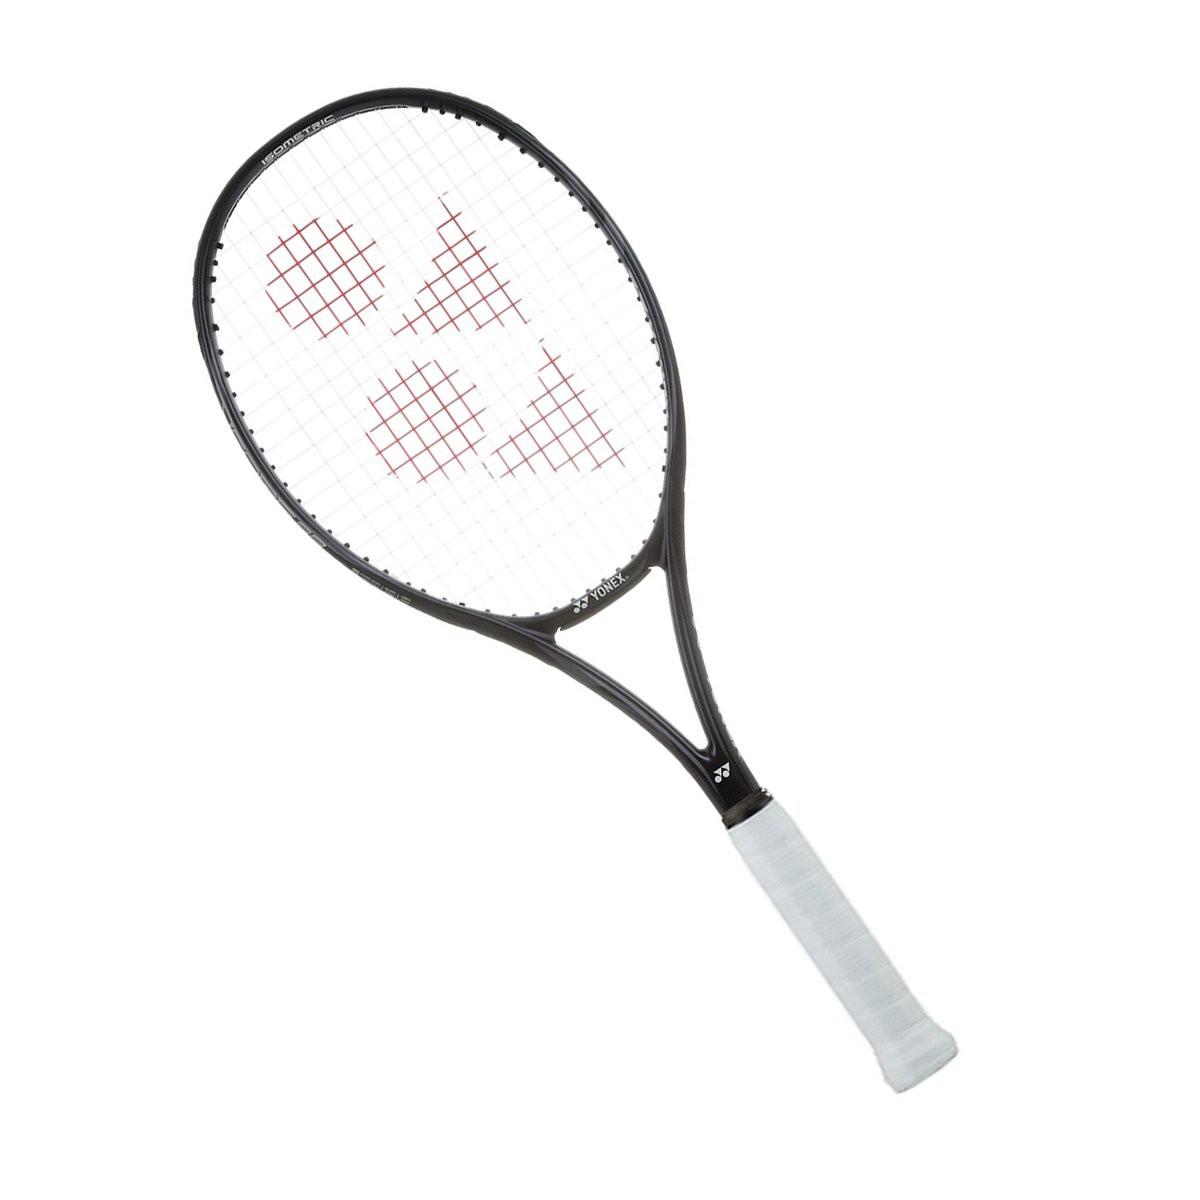 Raquete de Tenis Vcore 98 Galaxy Black 285G L2 - Yonex